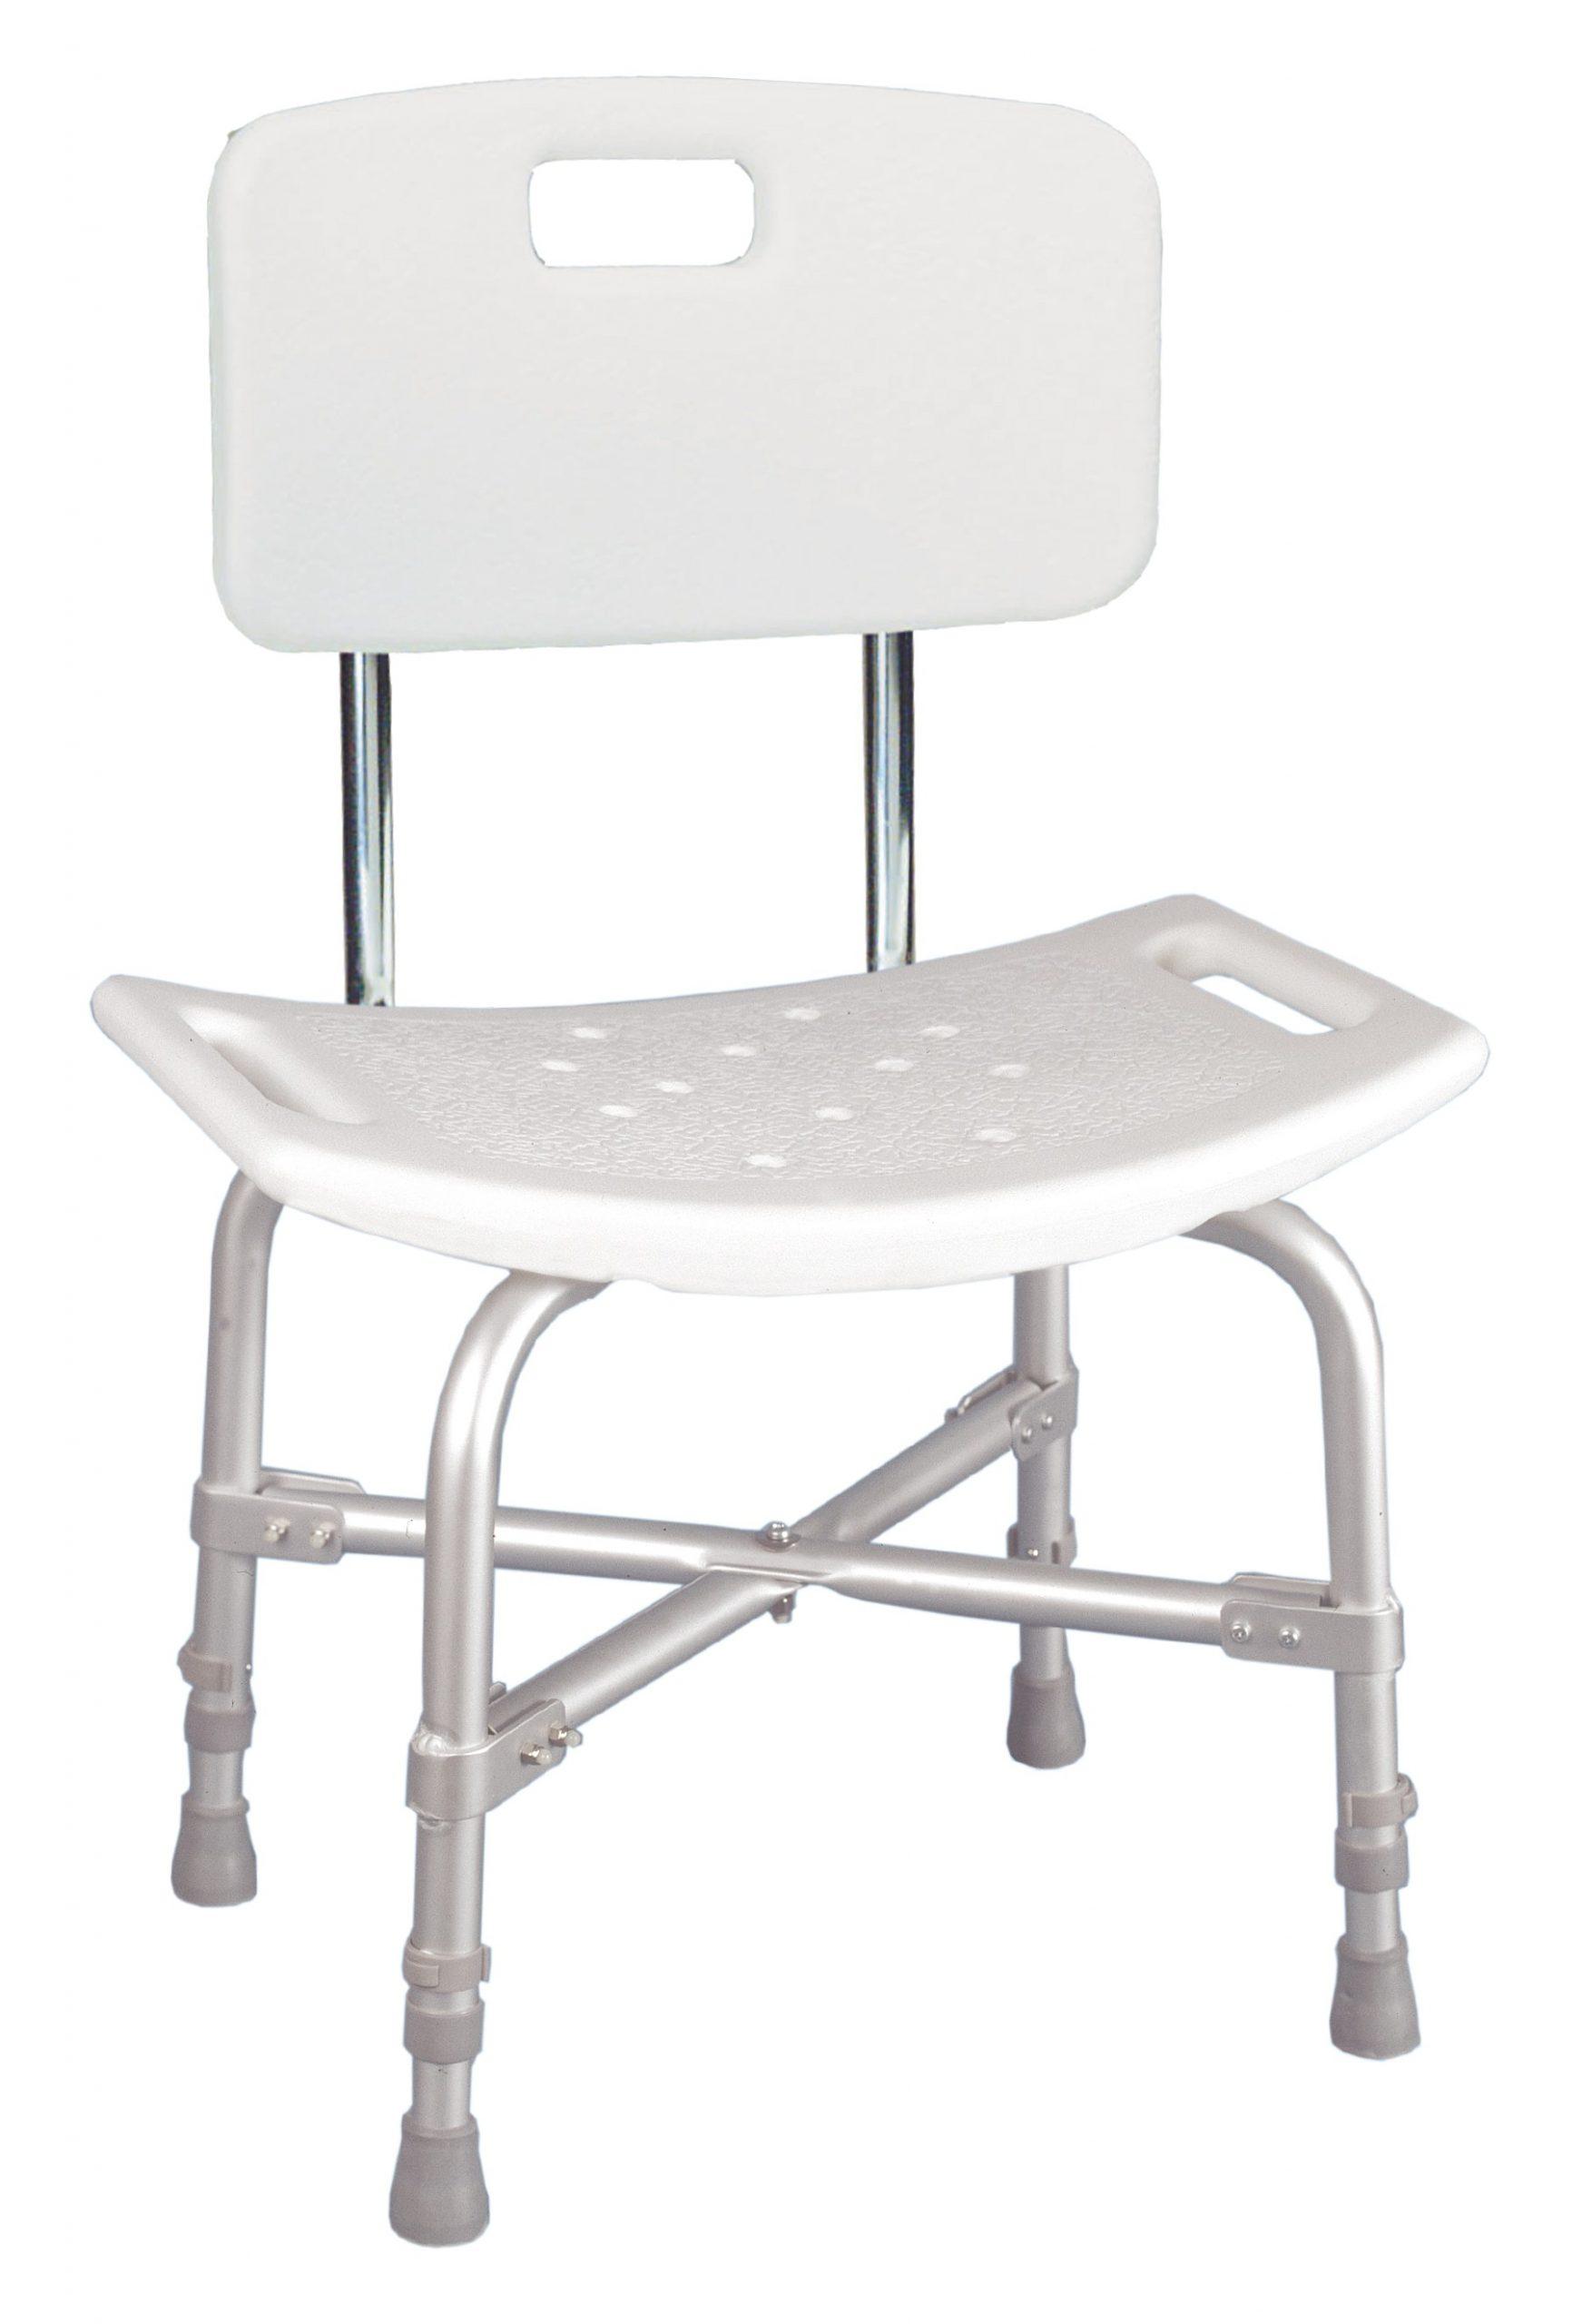 Bath/shower seat